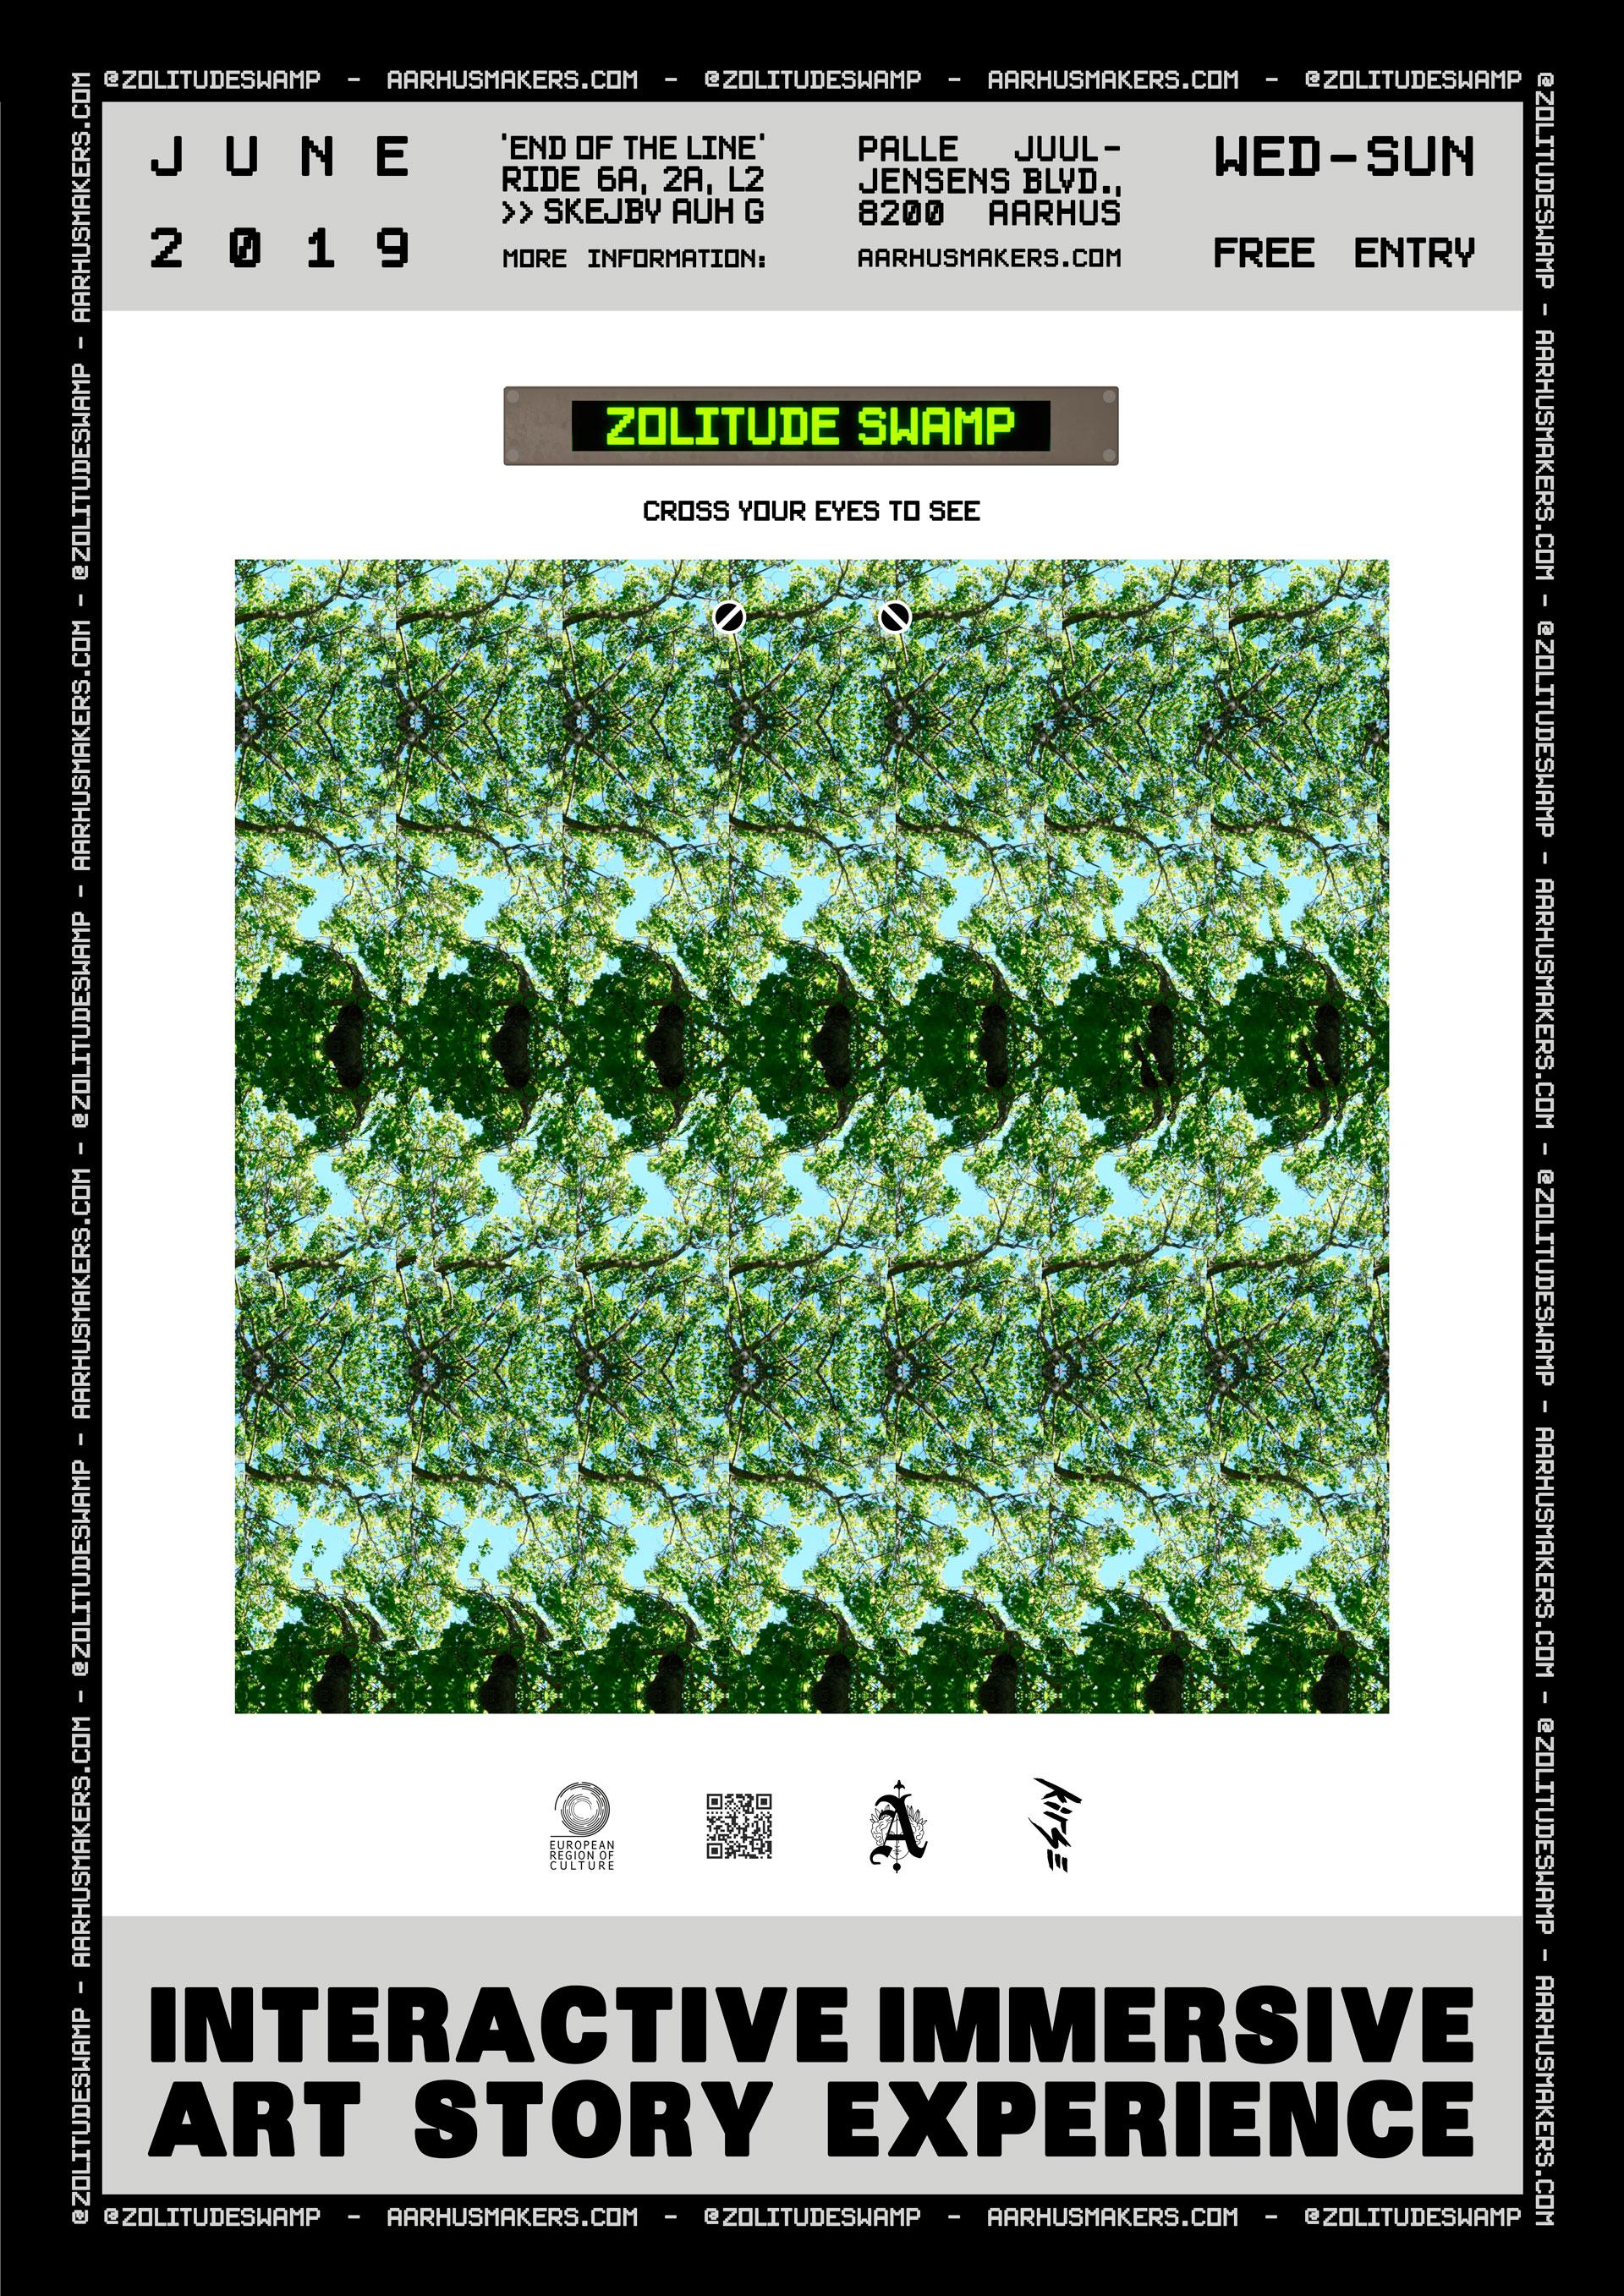 Zolitude-Swamp-PR-poster-magic-eye.jpg